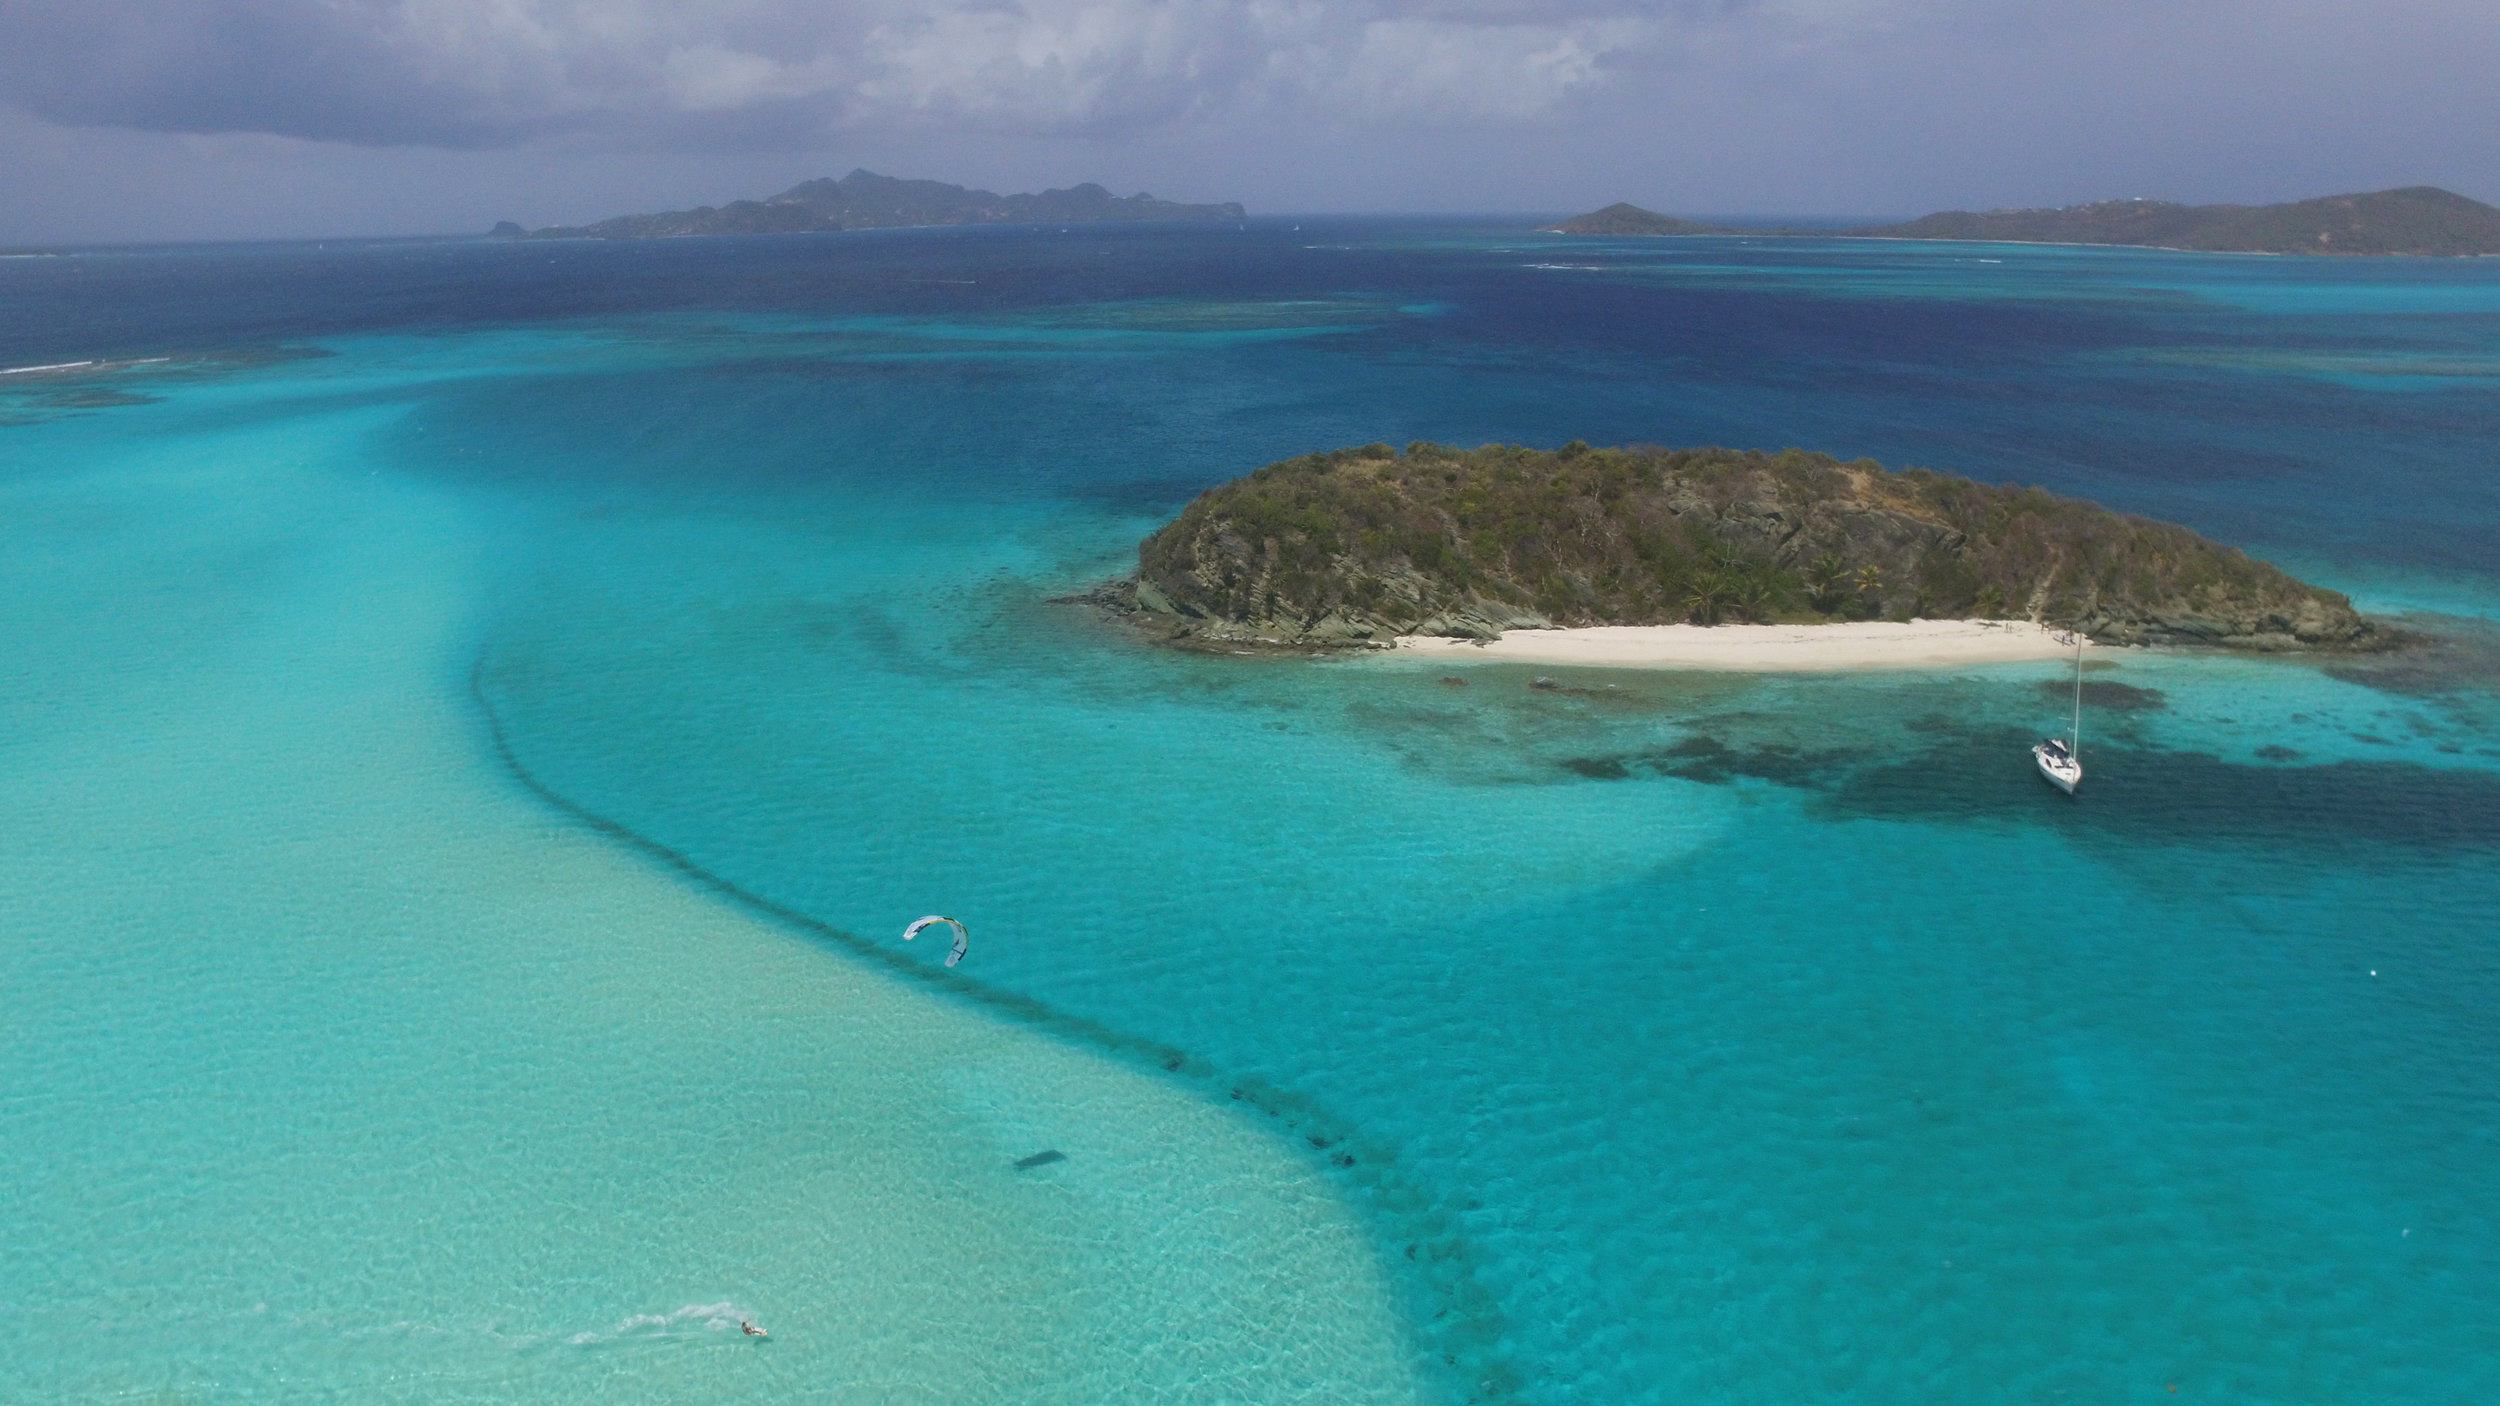 kitesurfing cruise grenadines tobago cays 1.jpg